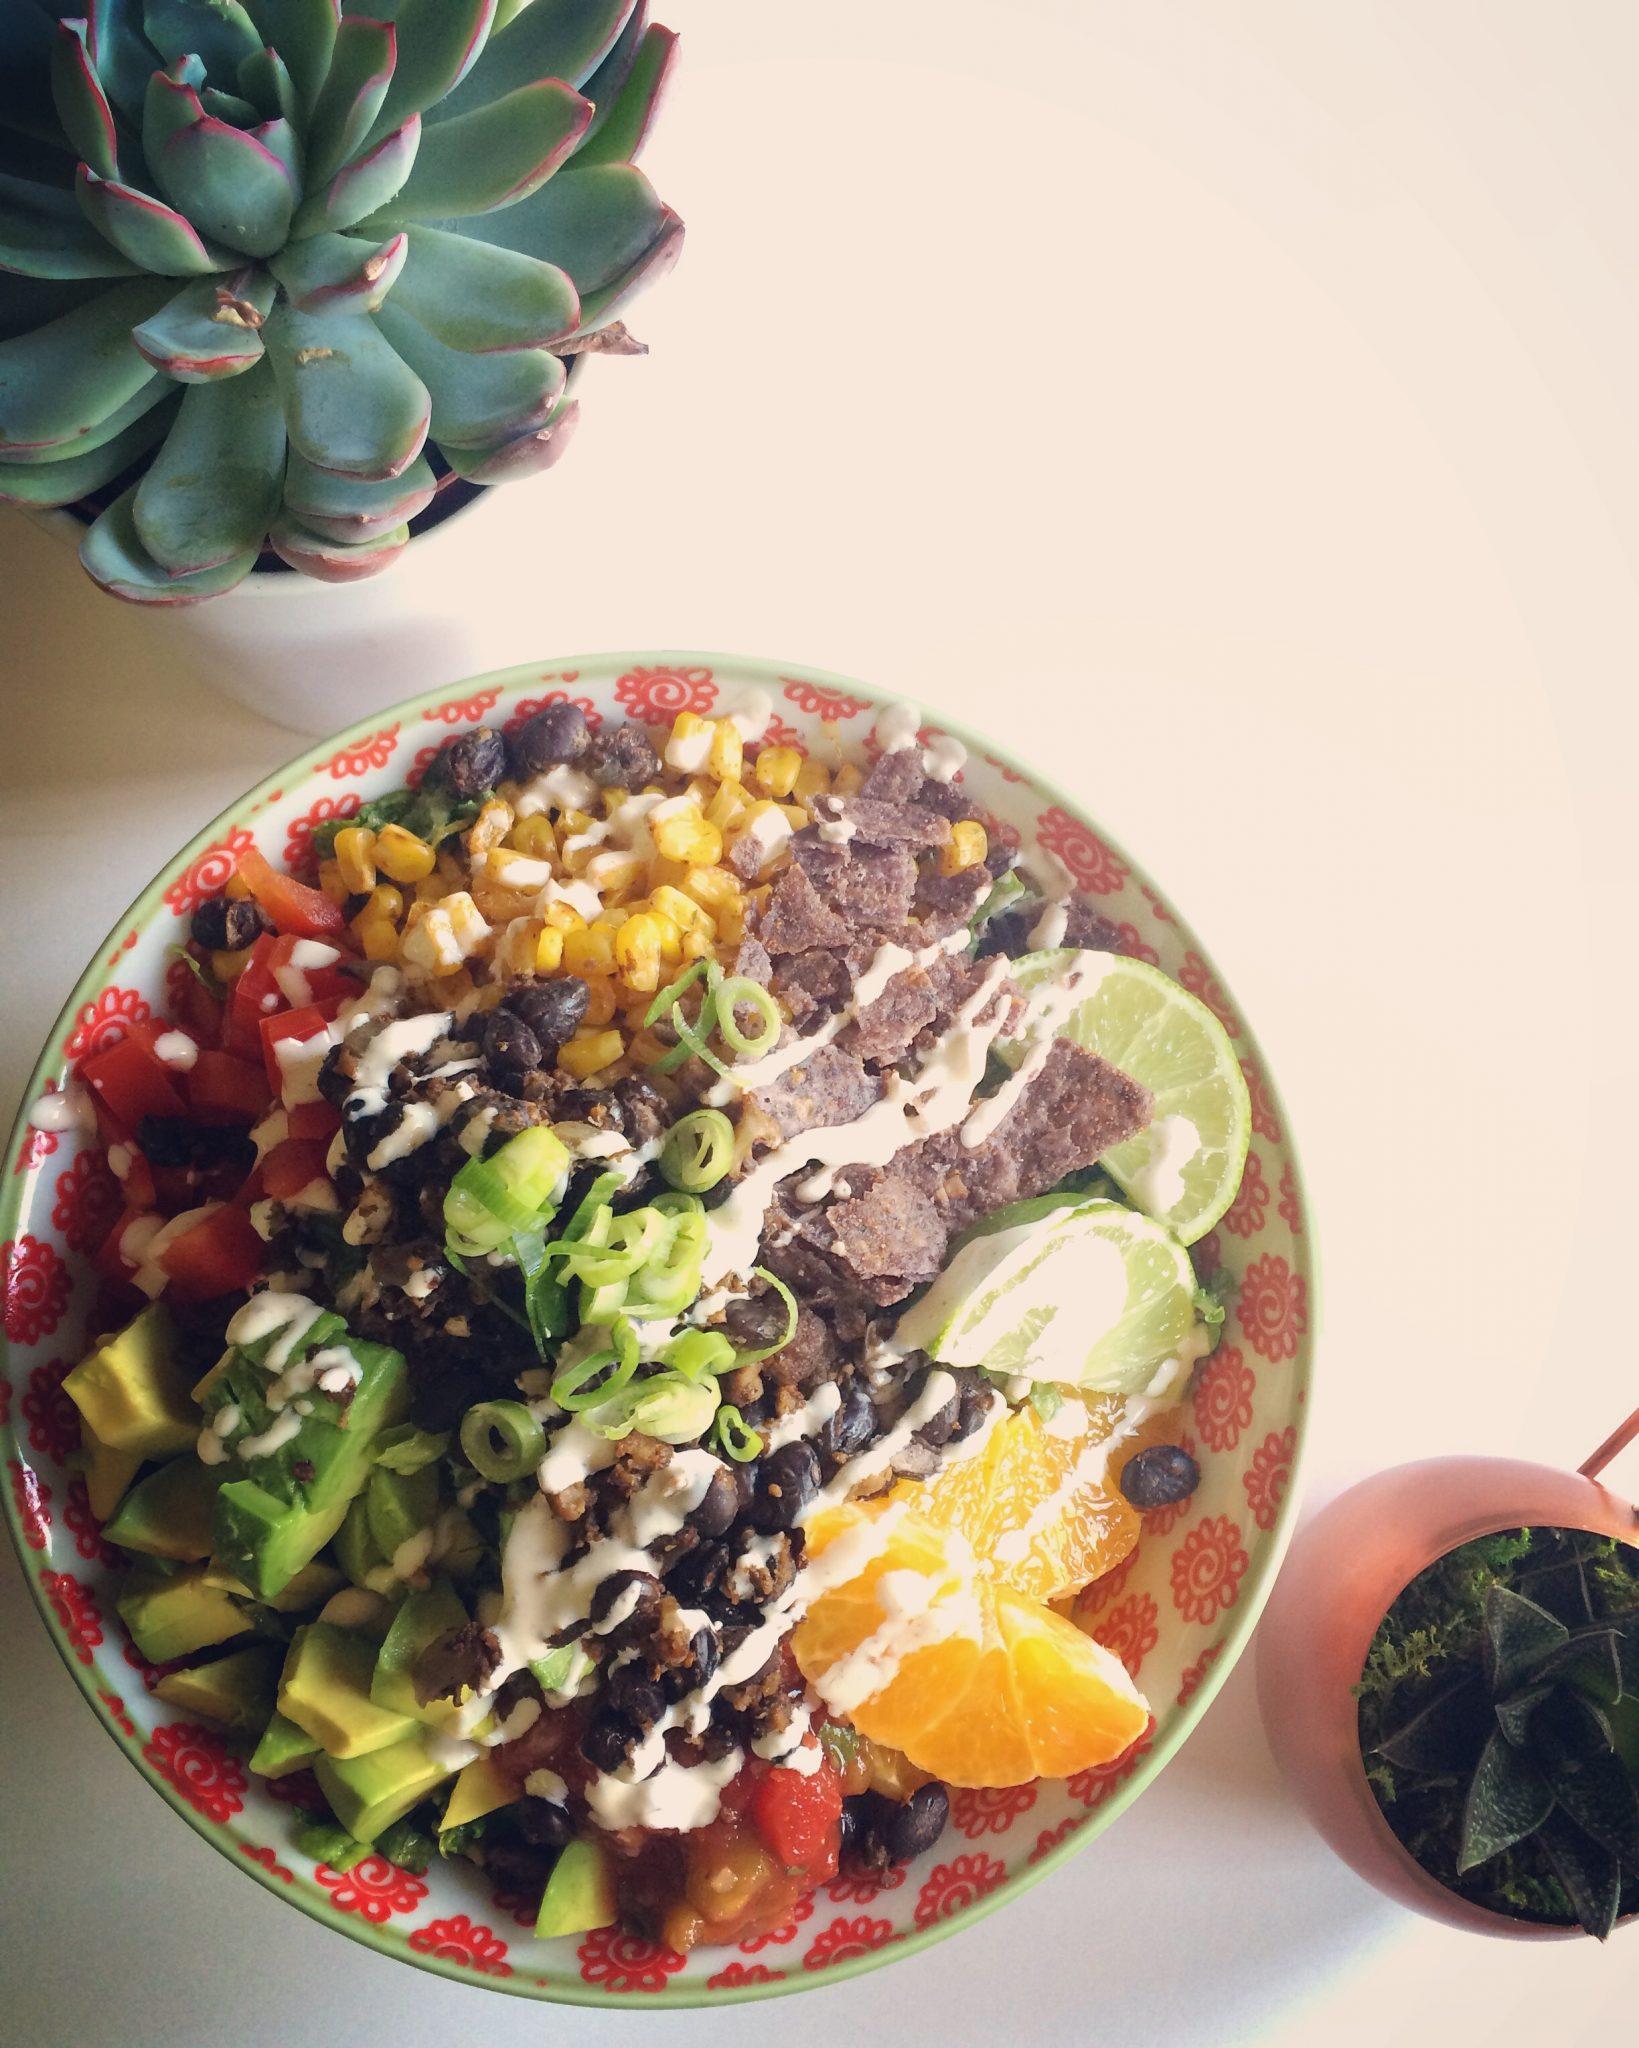 Friday Feast: Taco Salad with Blackened Corn + Chipotle Crema